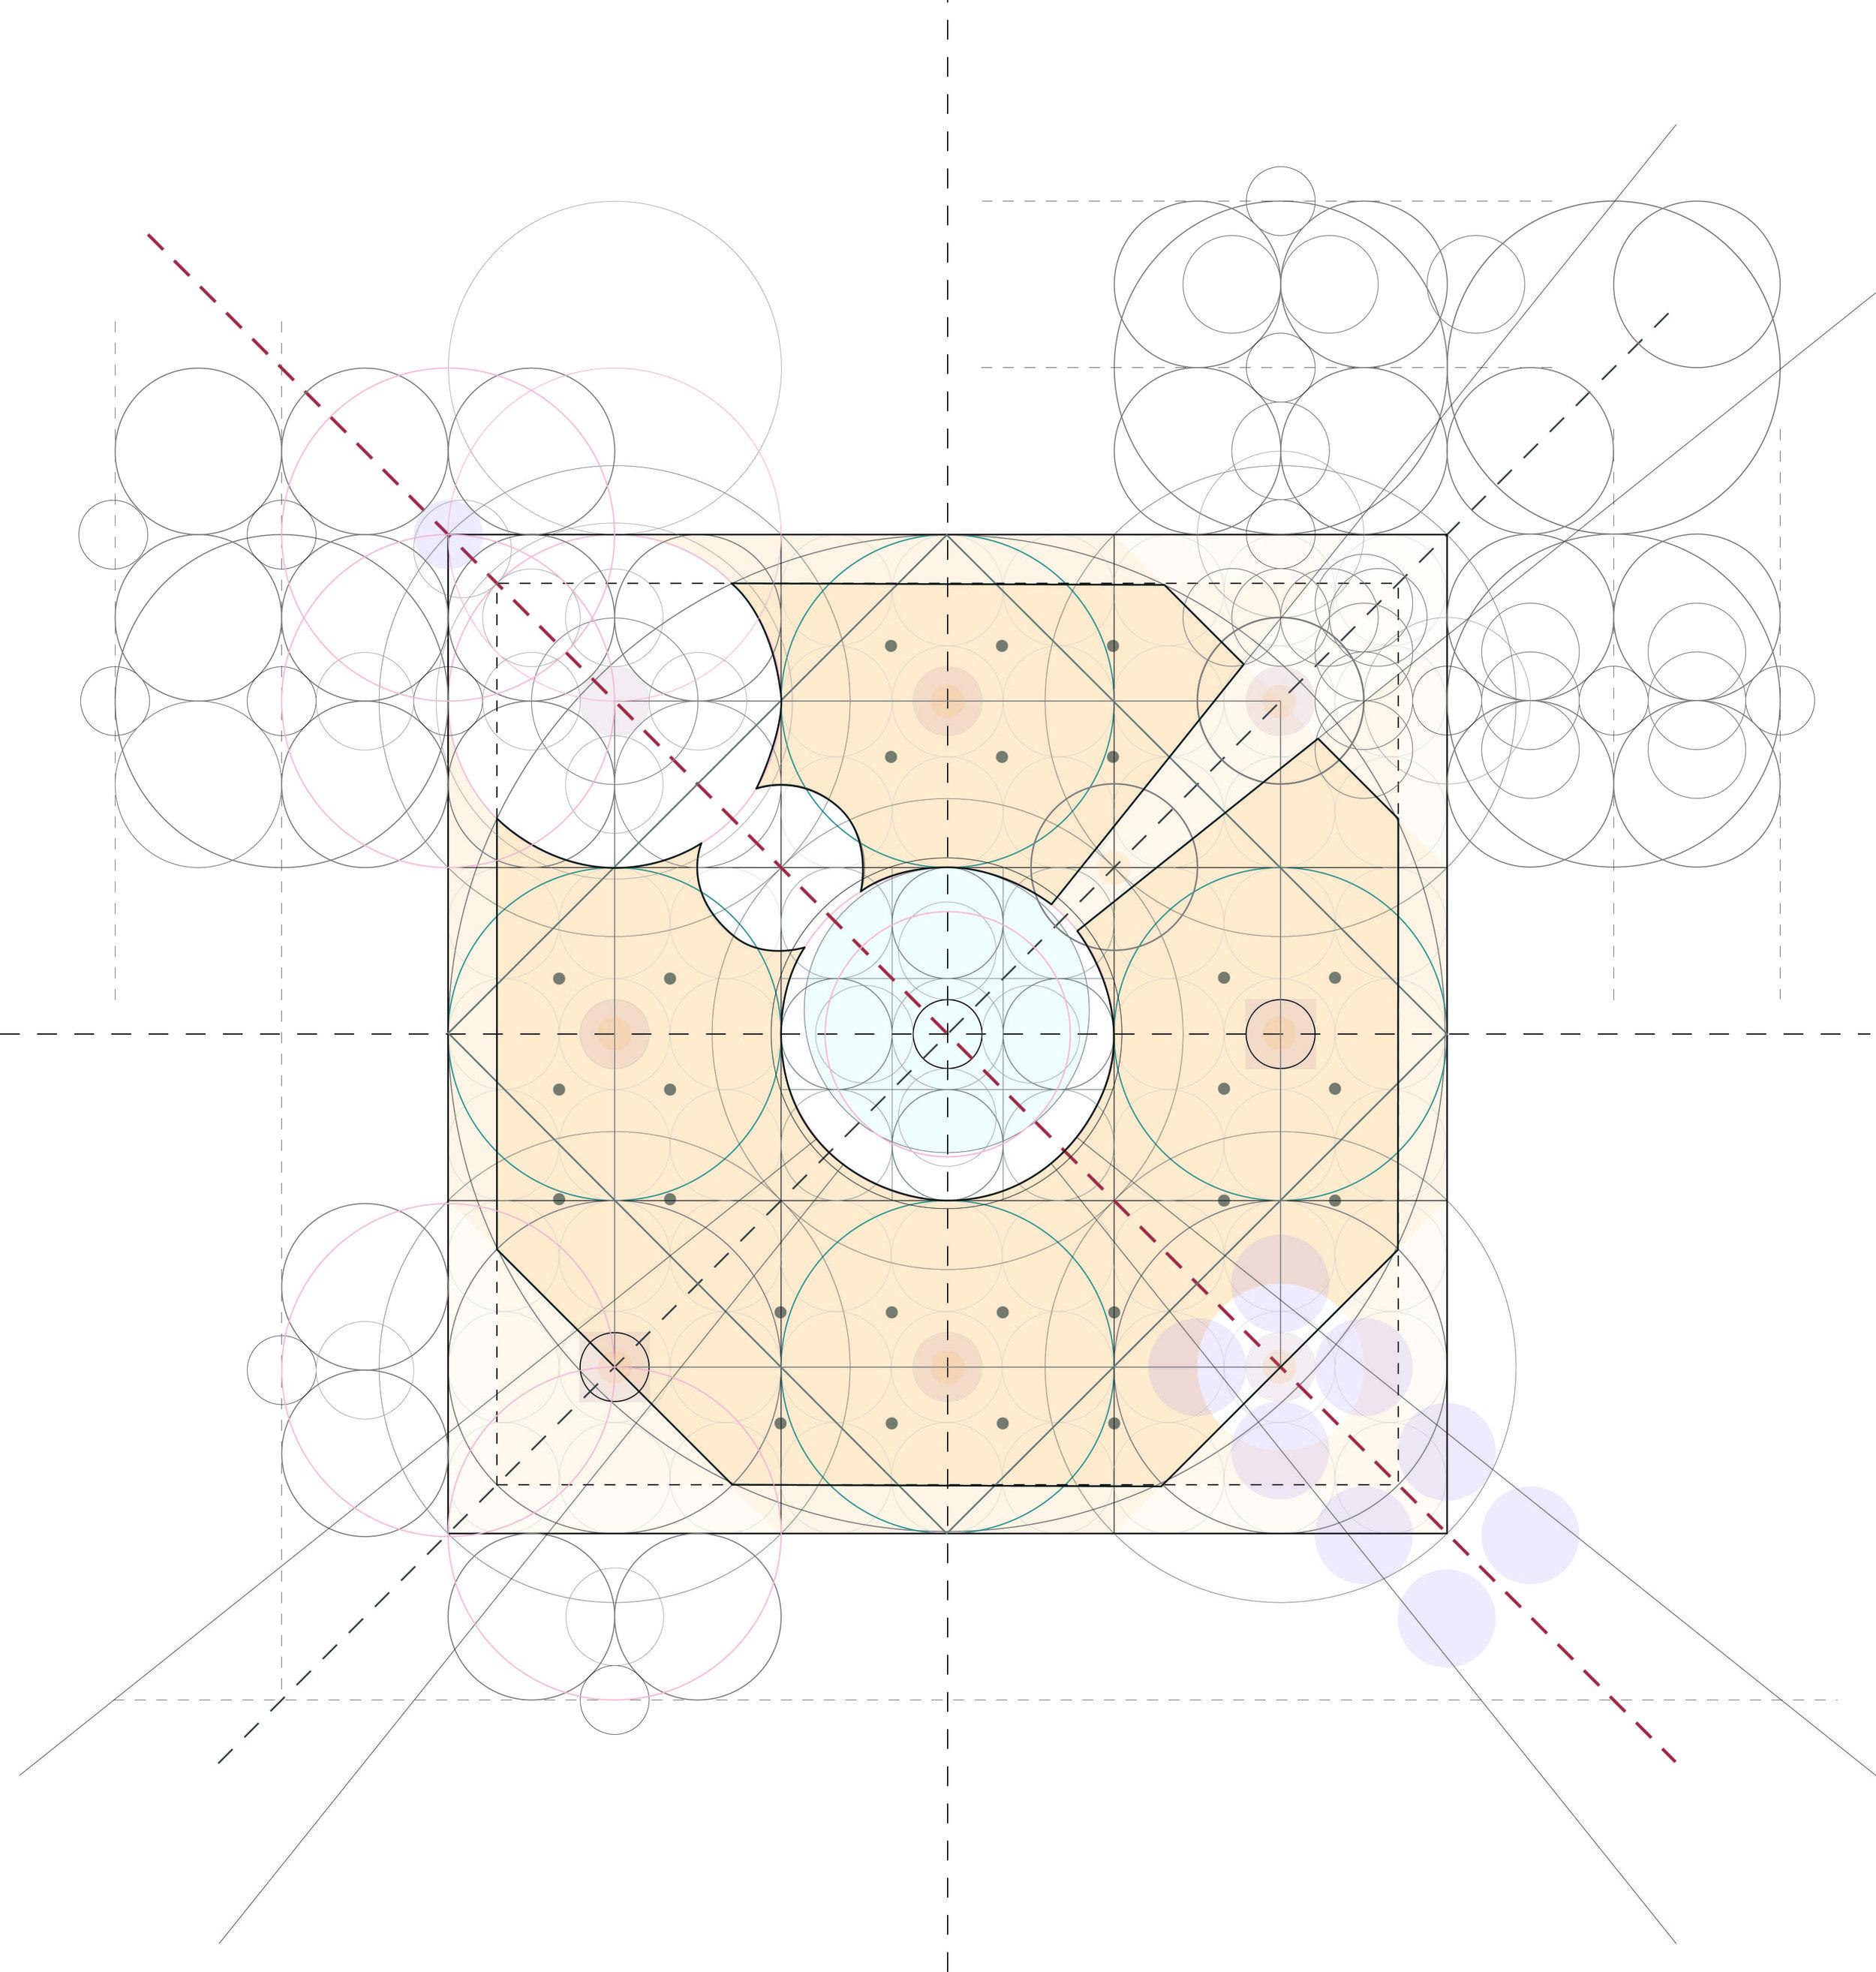 DameronArchitecture_SikhTempleWisconsin_2.jpg